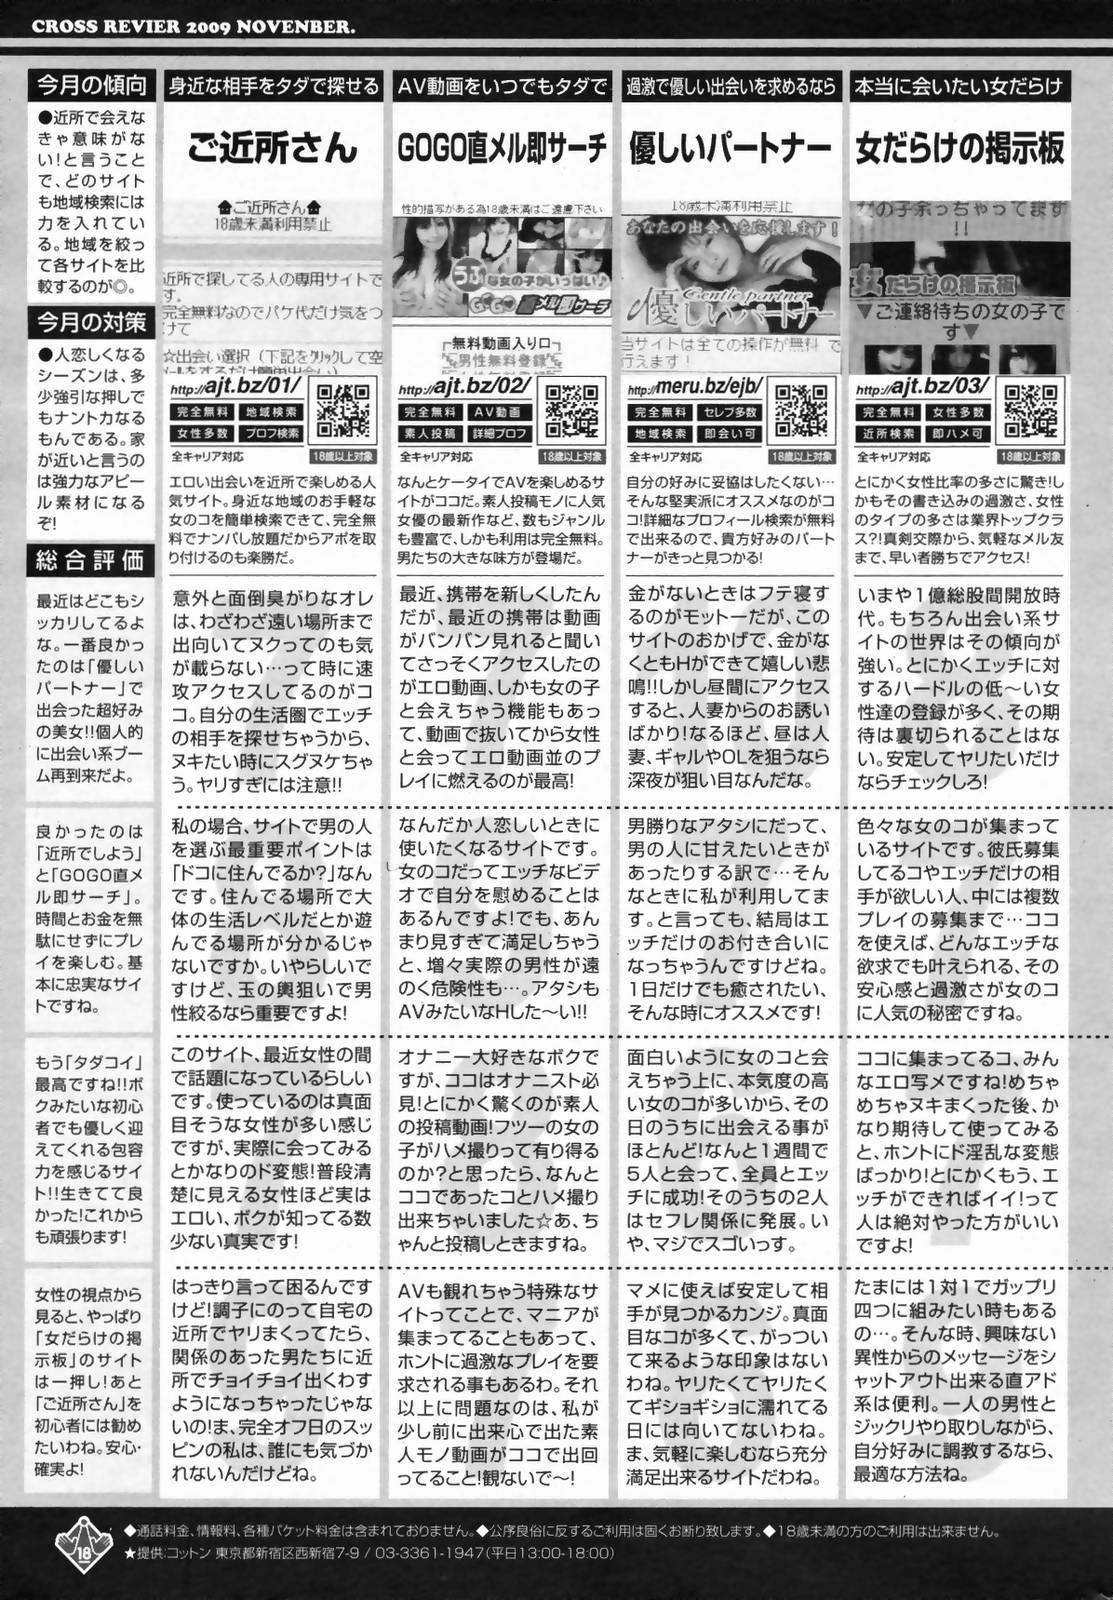 Manga Bangaichi 2009-02 Vol. 234 254